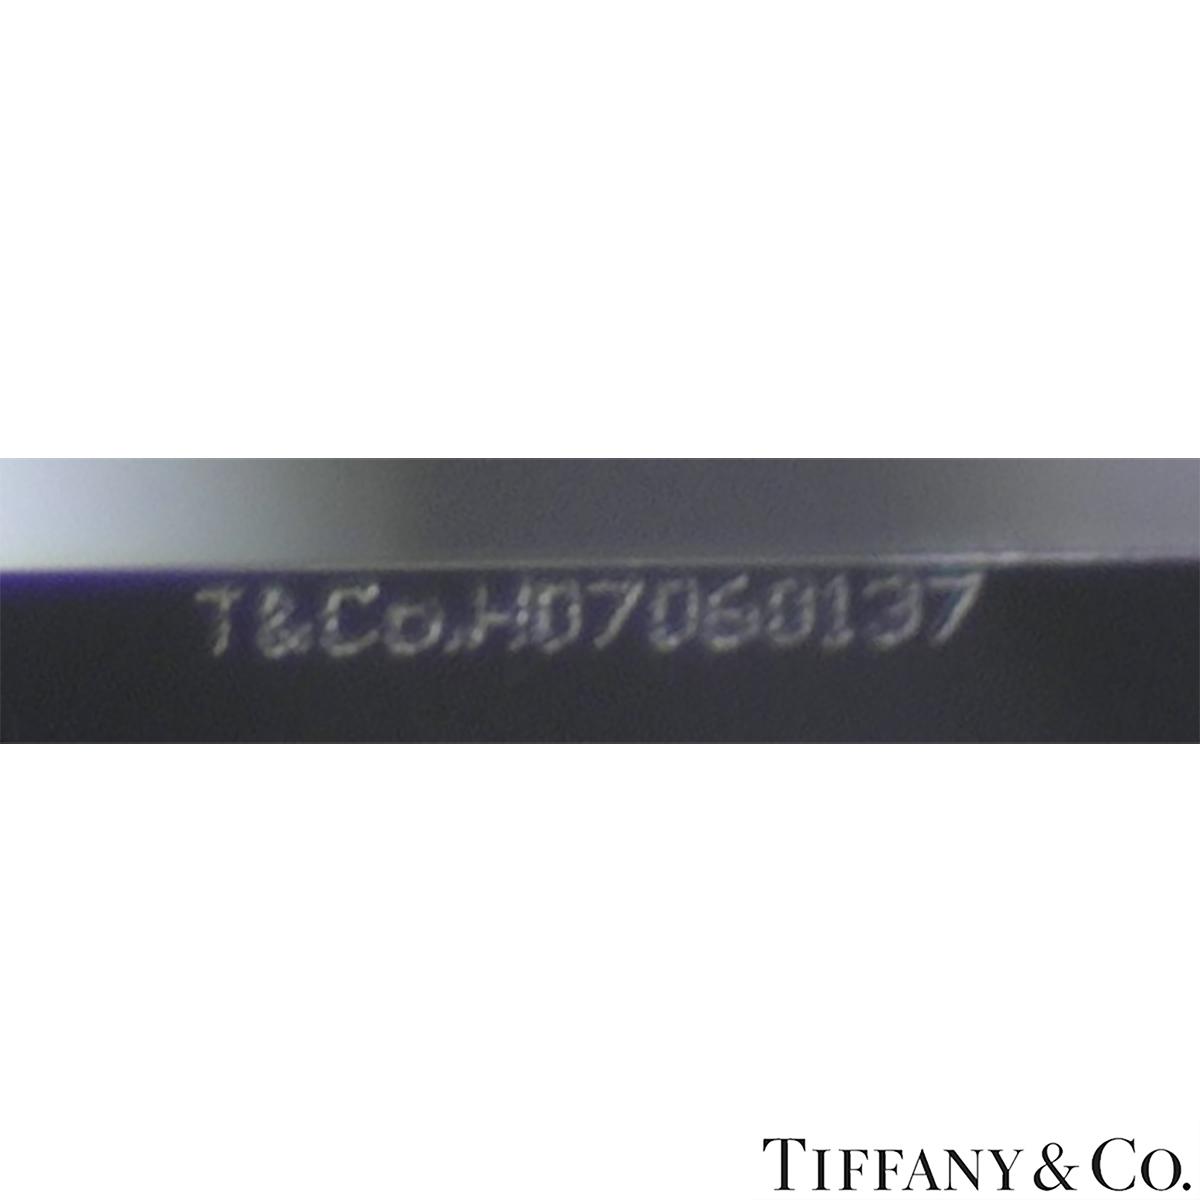 Tiffany & Co. Platinum Diamond Setting Ring 1.52ct D/VS2